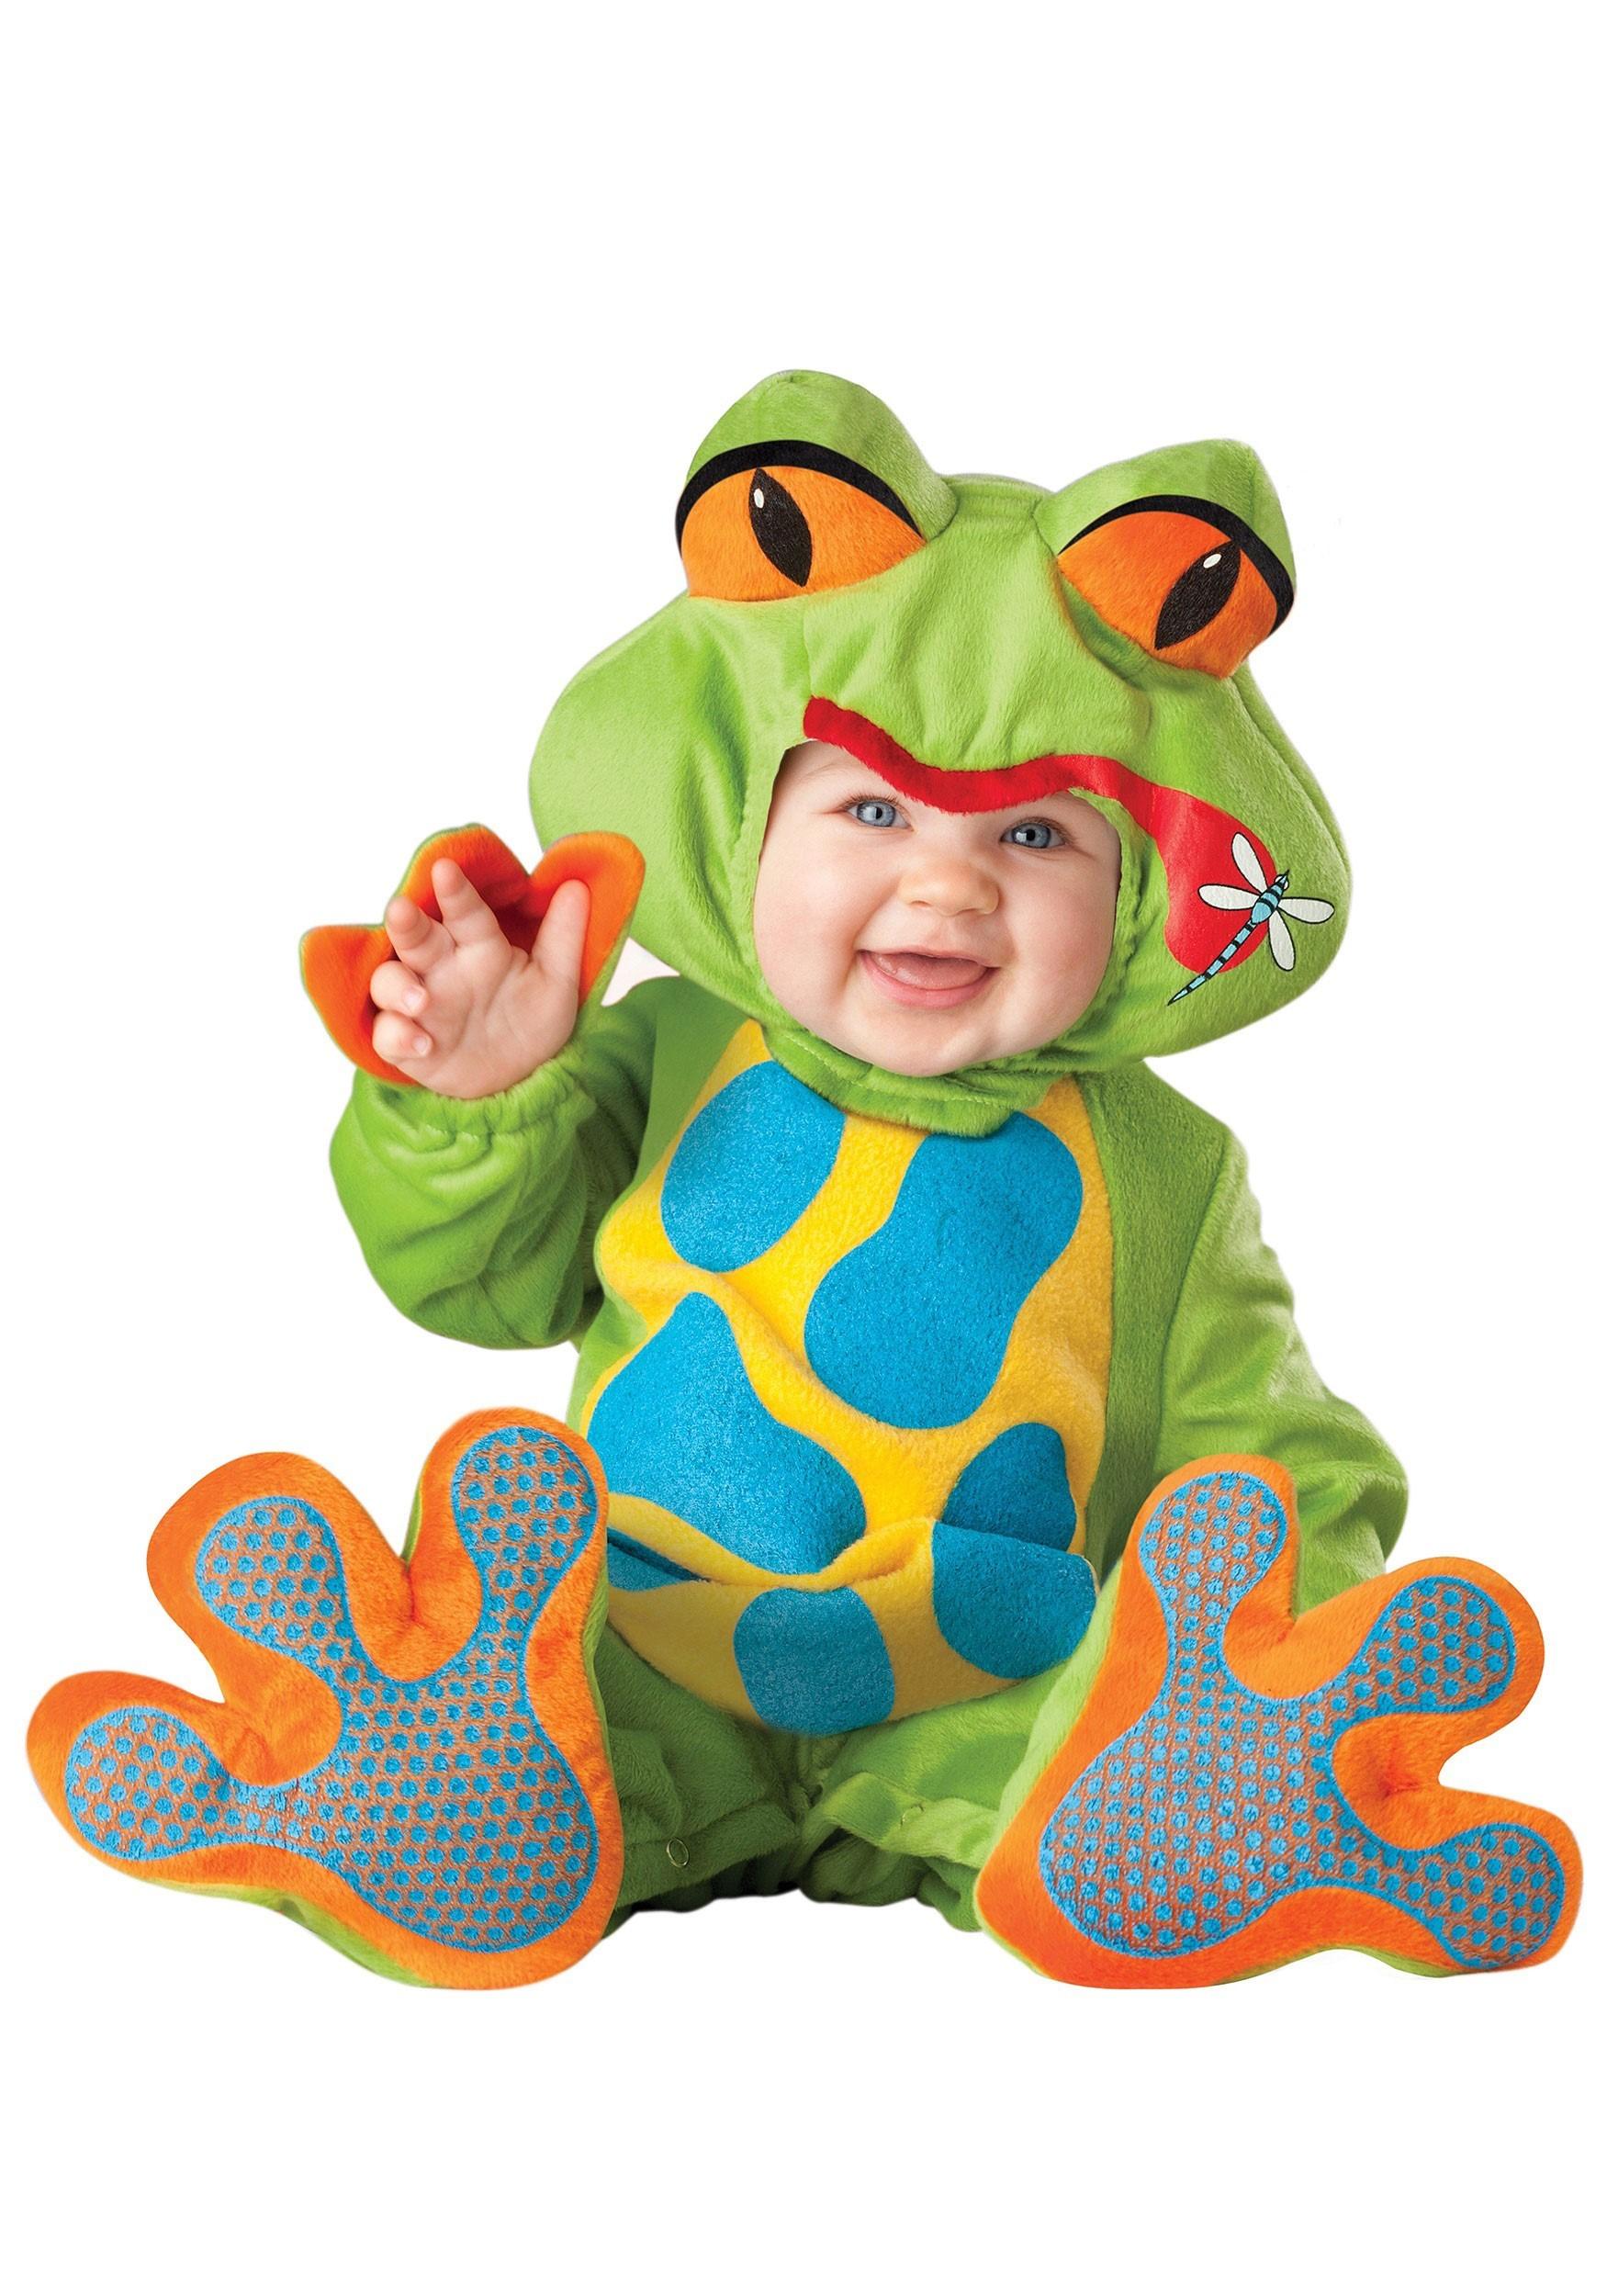 Lil Baby Frog Costume  sc 1 st  Halloween Costume & Lil Baby Frog Costume - Infant Animal Costumes